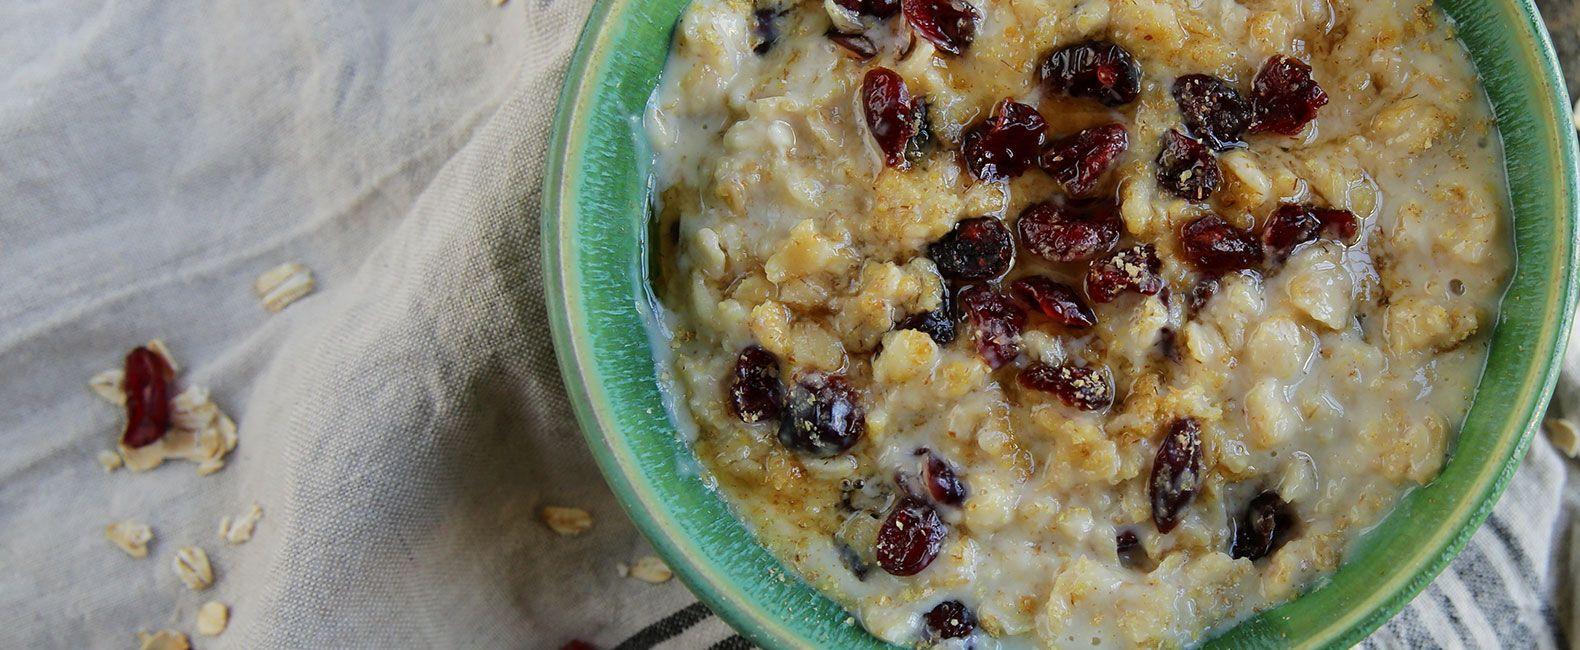 Creamy maple cranberry oatmeal recipe oatmeal oatmeal